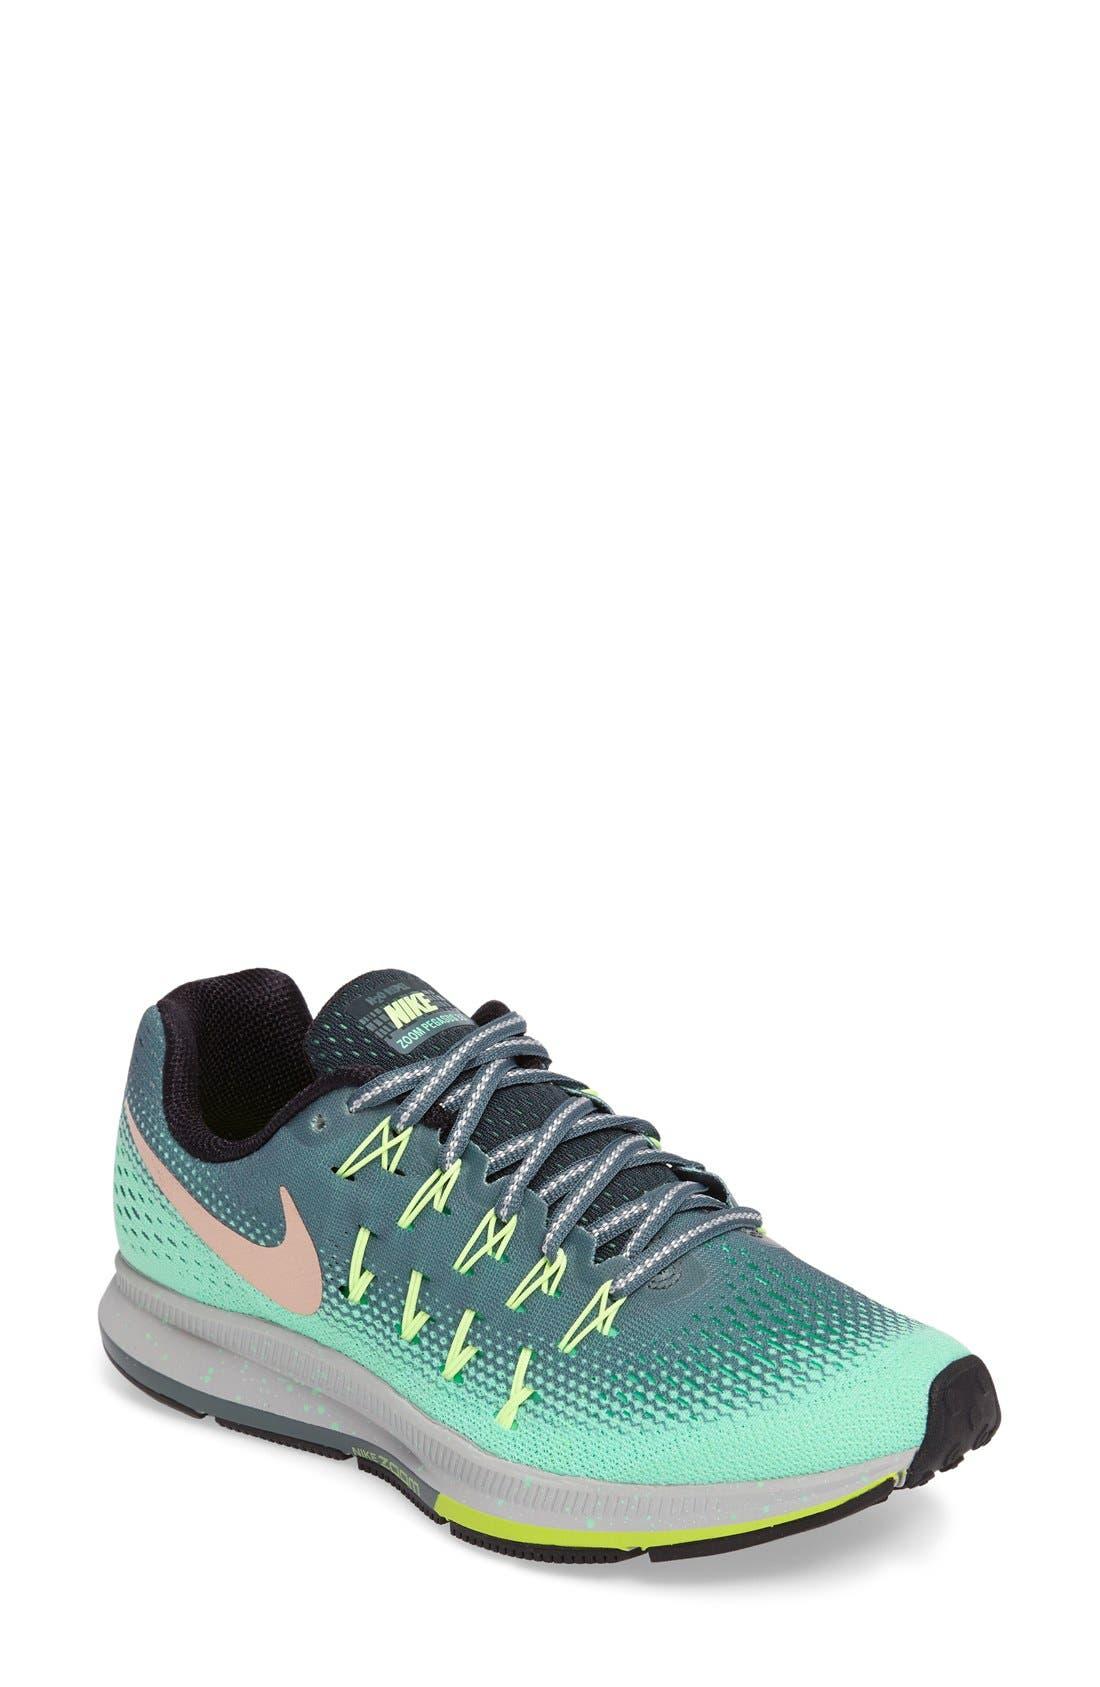 ... Main Image - Nike Air Zoom Pegasus 33 Shield Running Shoe (Women) ...